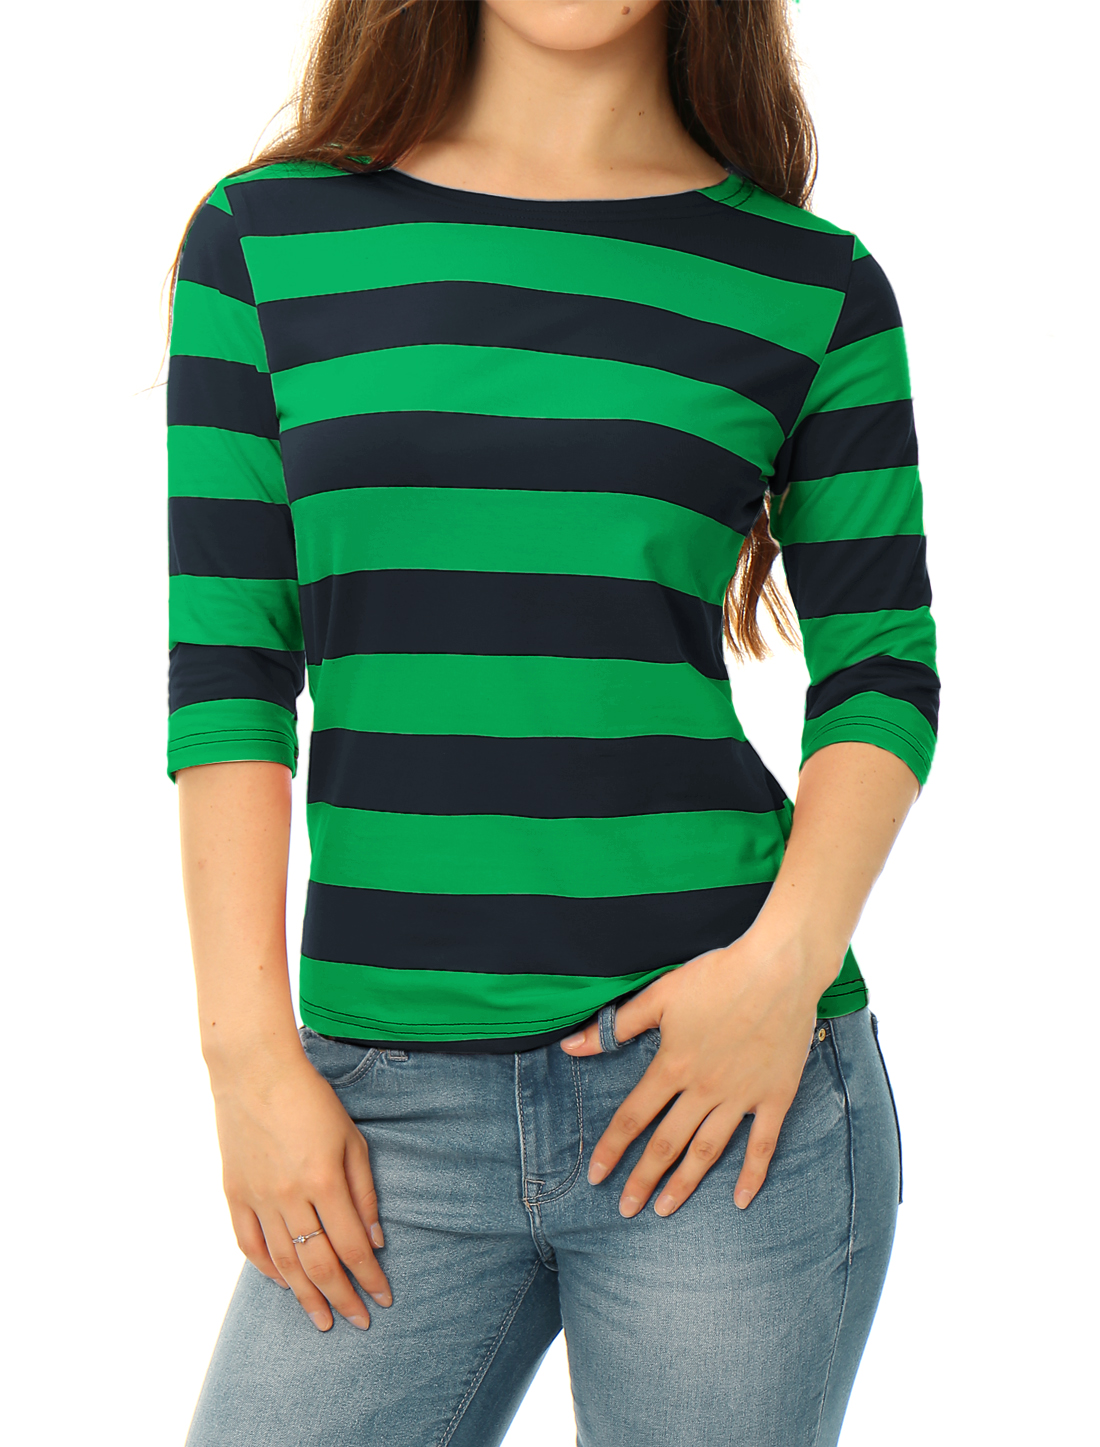 Allegra K Women Half Sleeves Boat Neck Slim Fit Stripe Tee Dark Green M